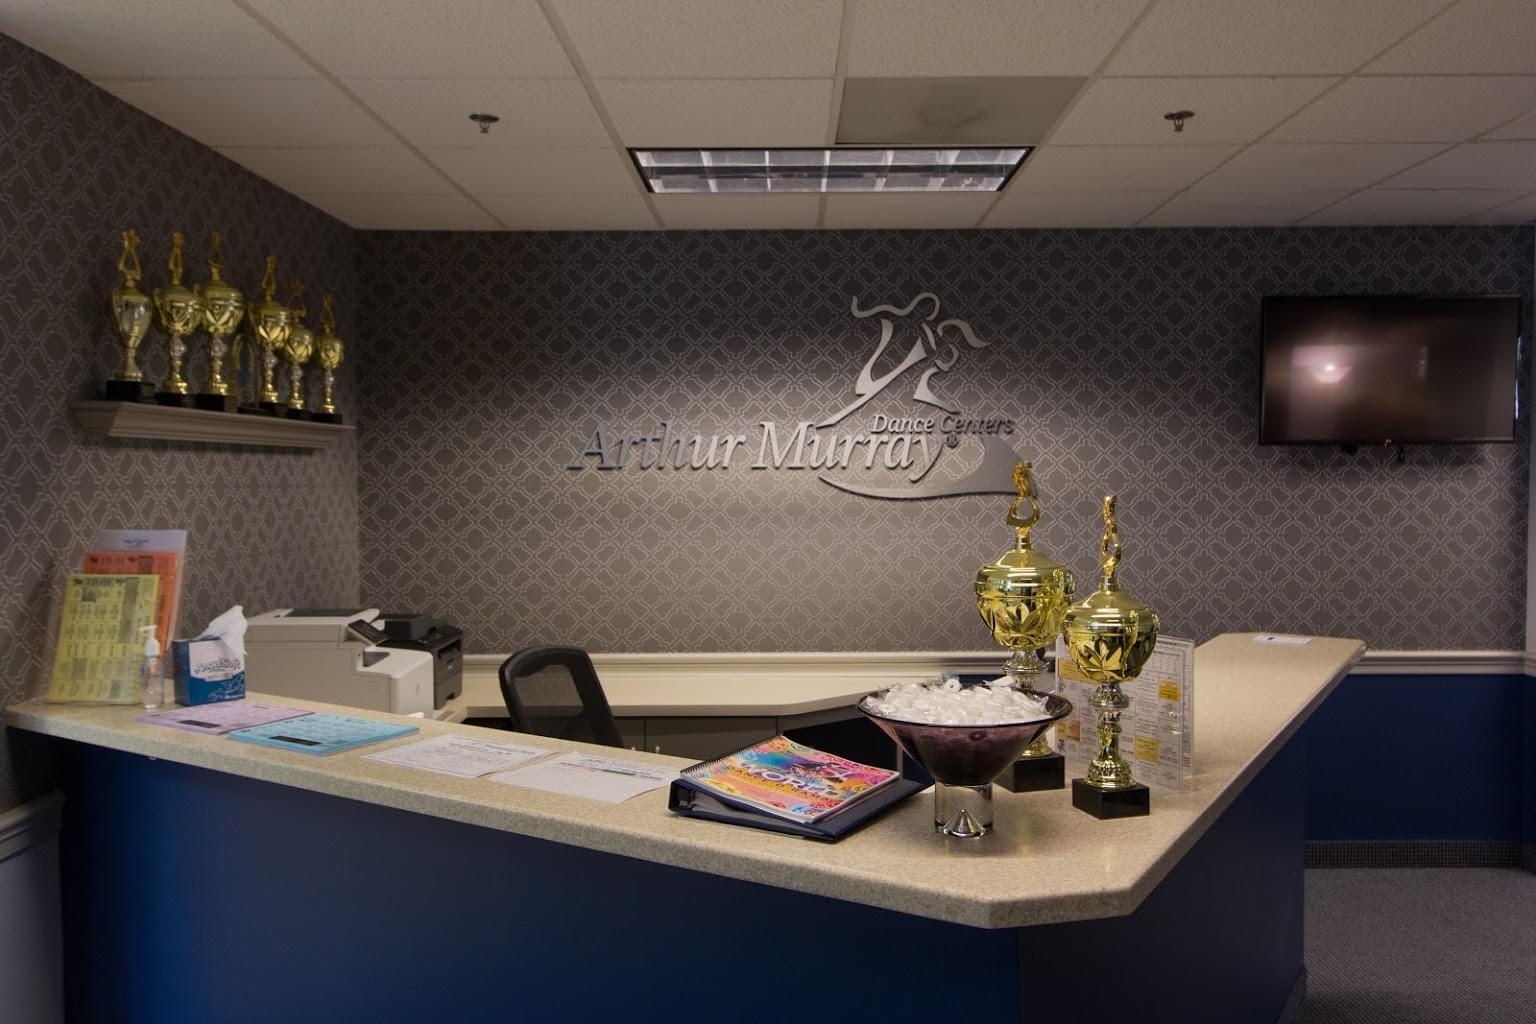 Arthur Murray Dance Center Dance Studio reception desk in Gaithersburg, MD.jpg